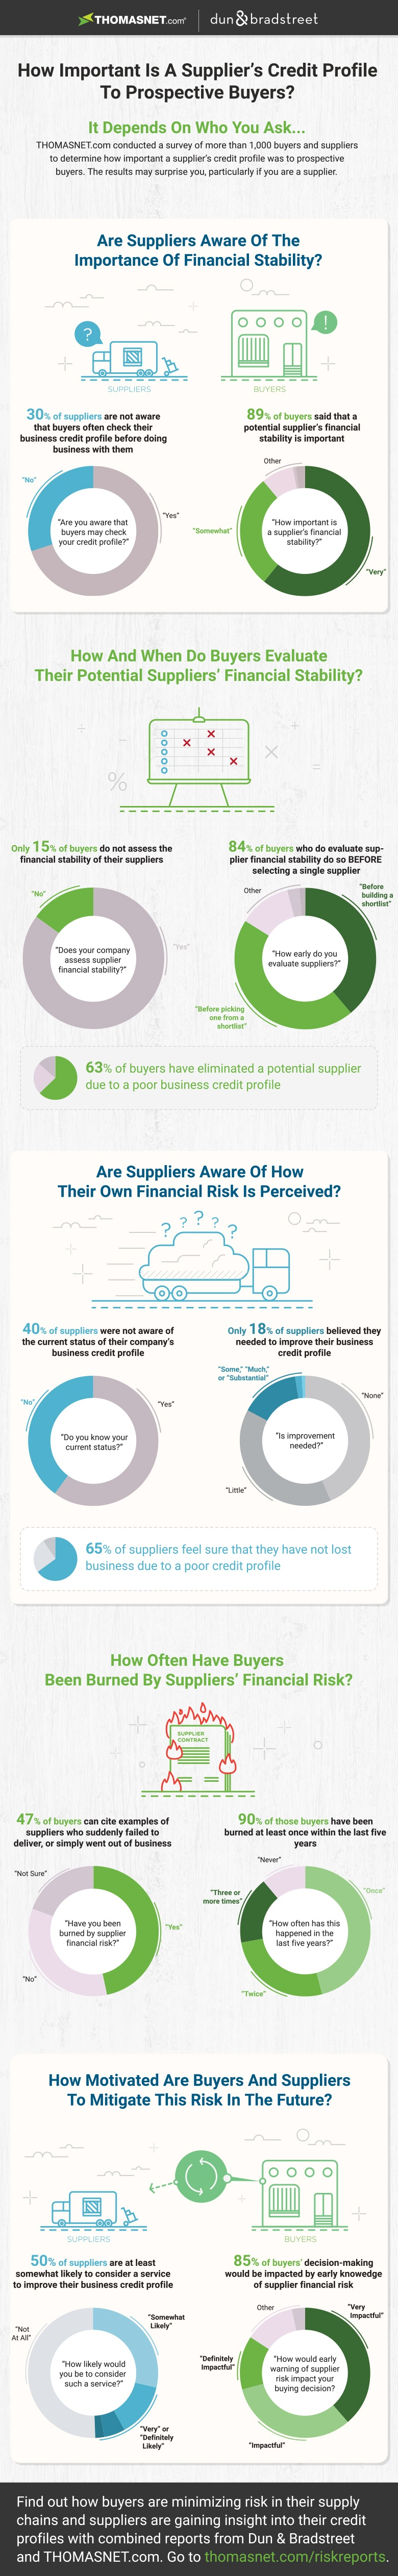 DNB THOMASNET.com survey graphic_2-v4 side1v2.jpg